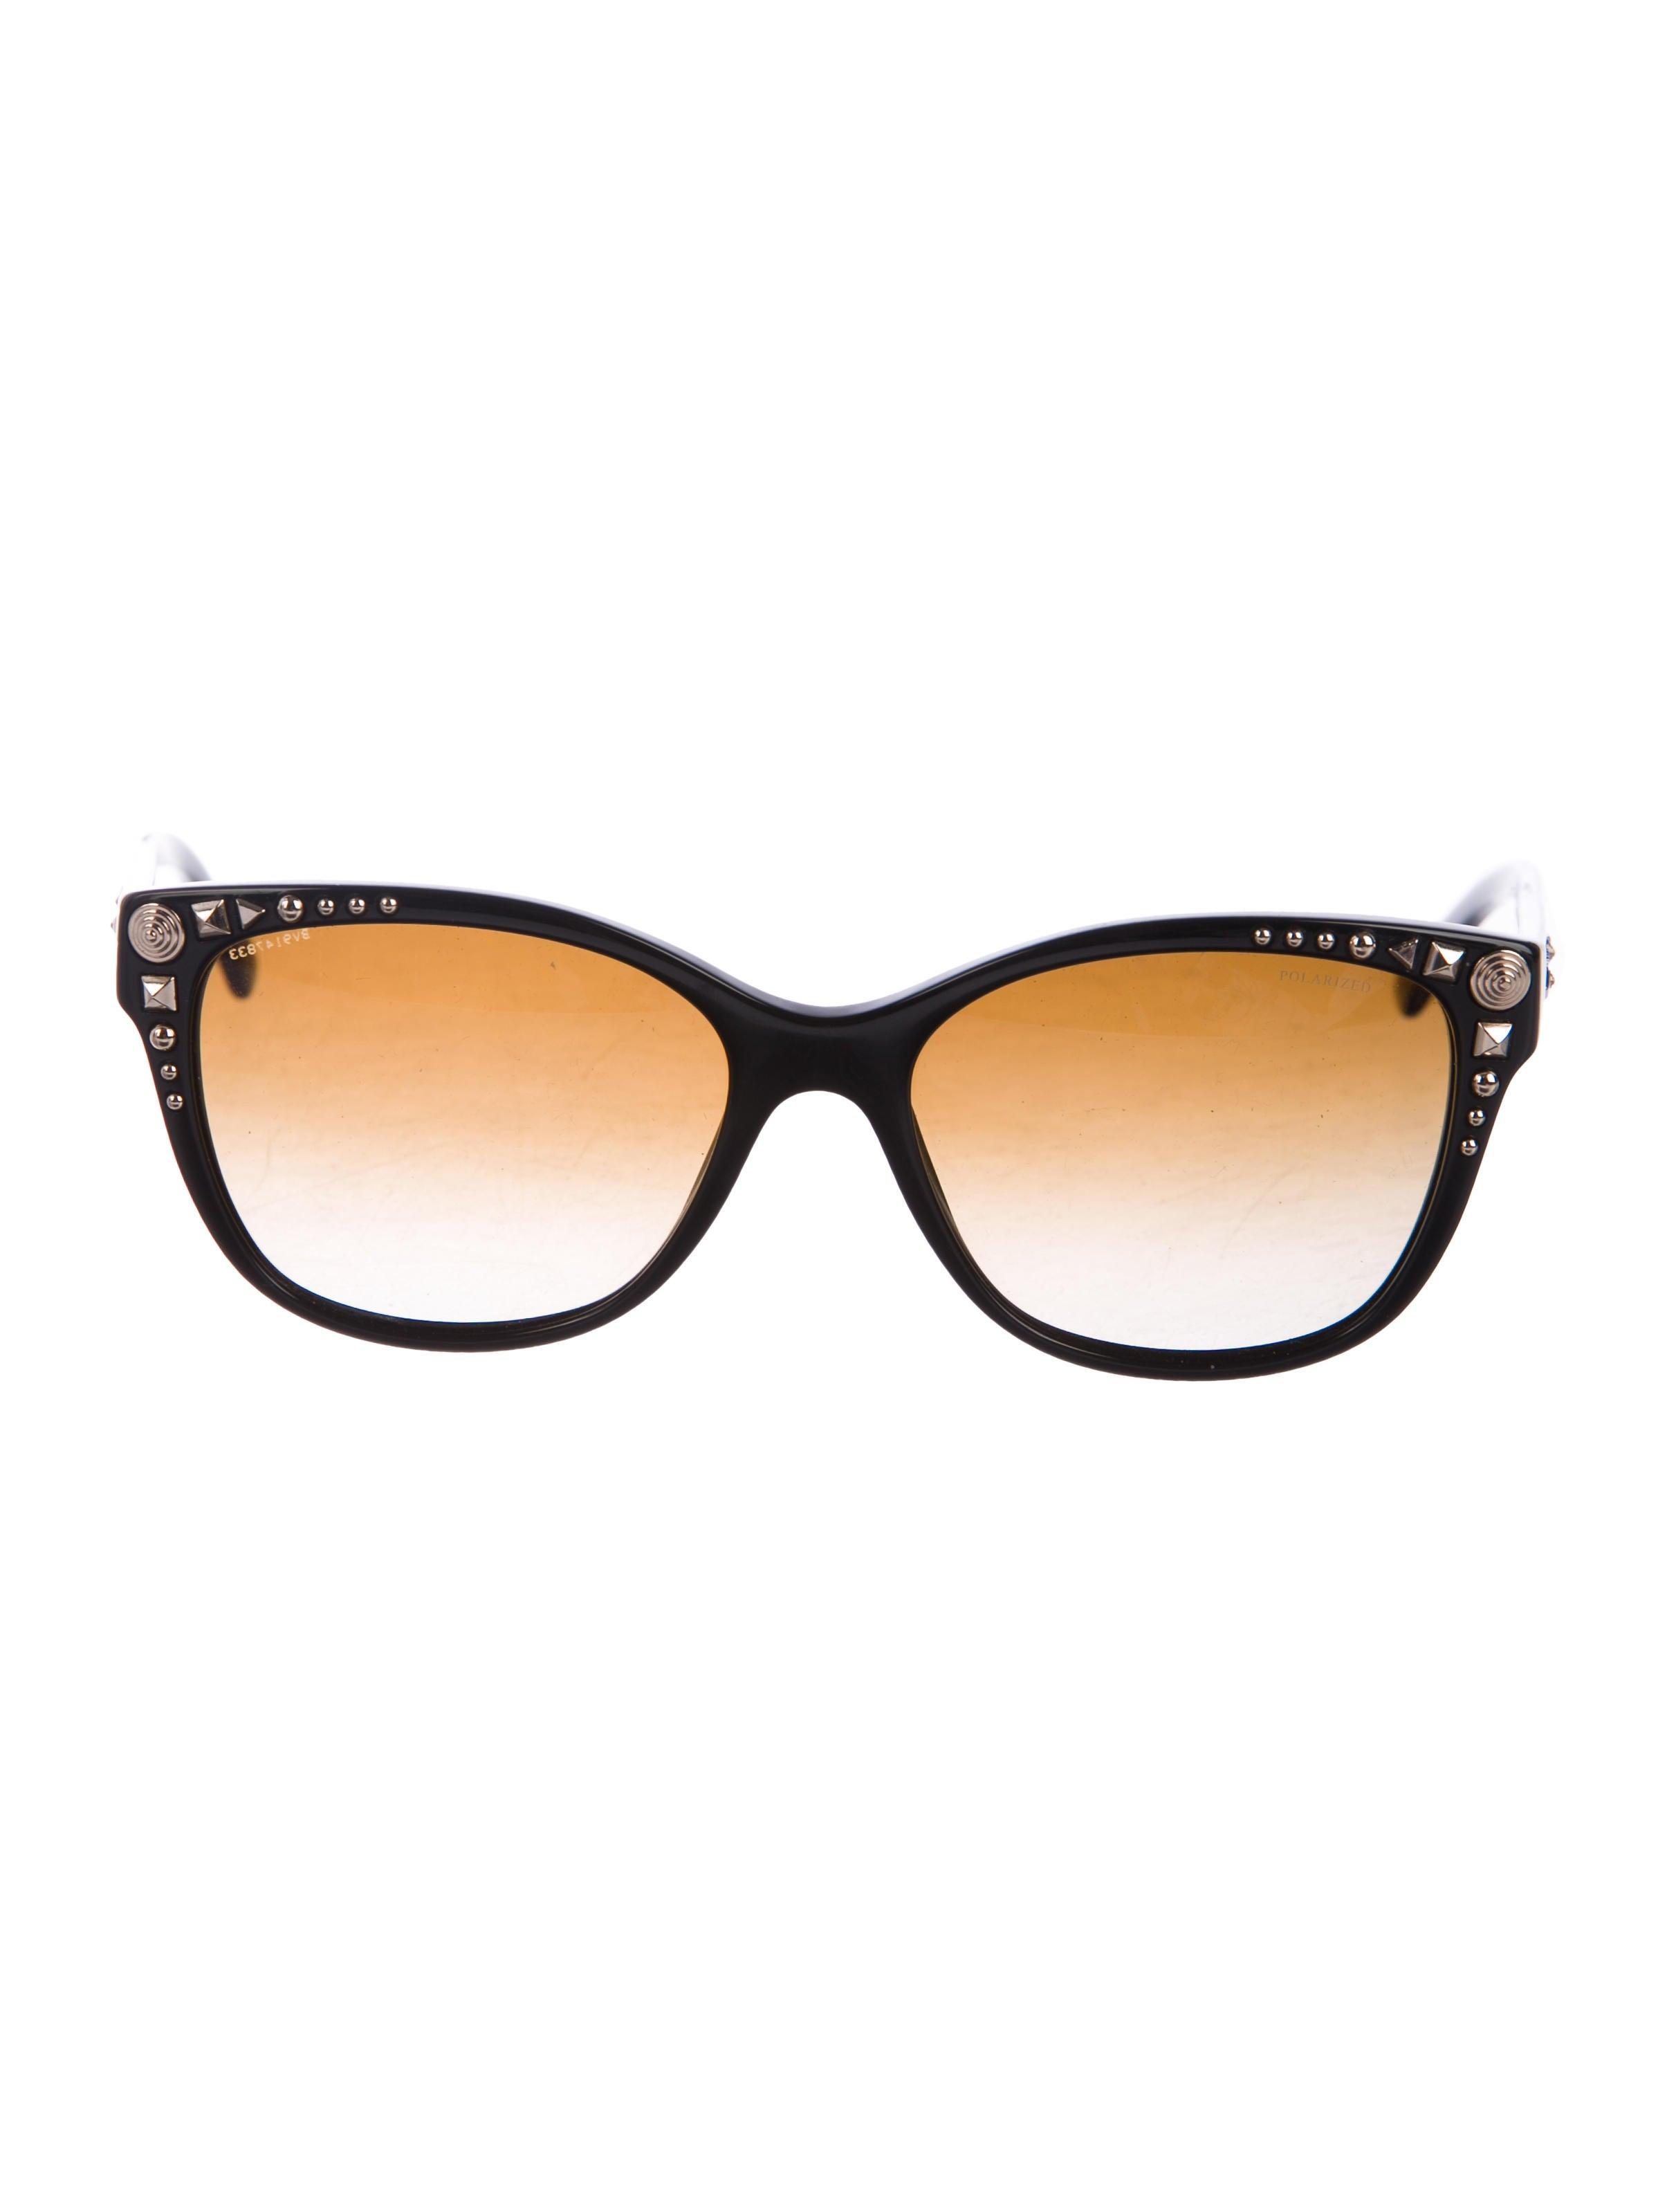 c8904bdae9b Versace Embellished Cat-Eye Sunglasses - Accessories - VES34875 ...